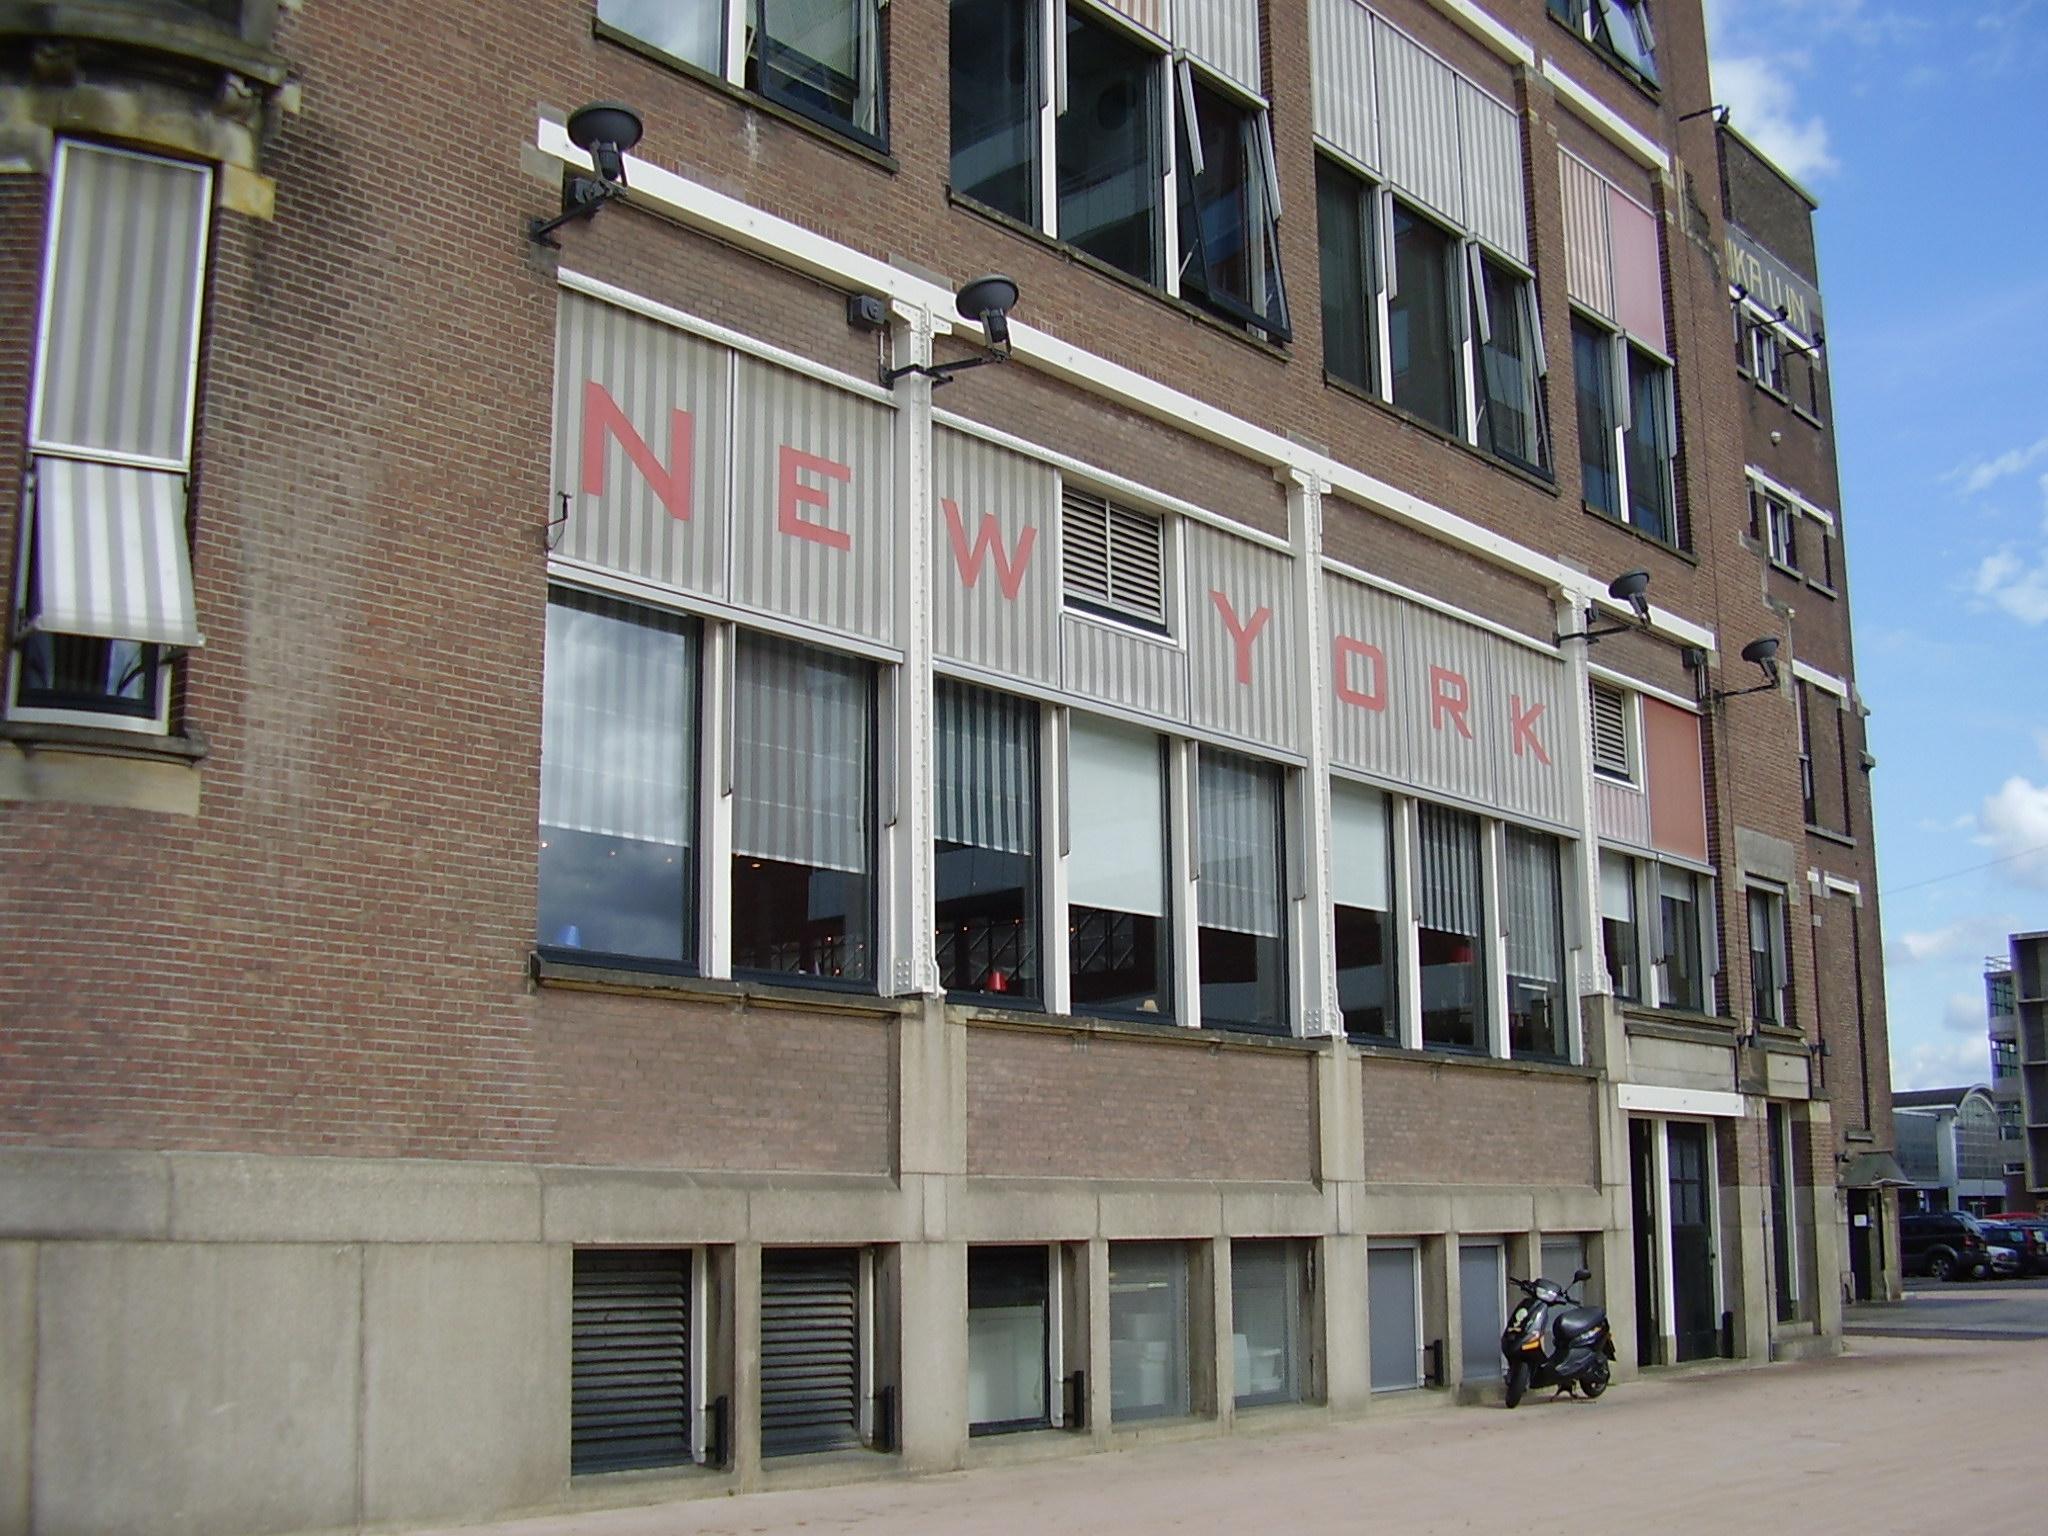 Hotel new york rotterdam for Hotel new york